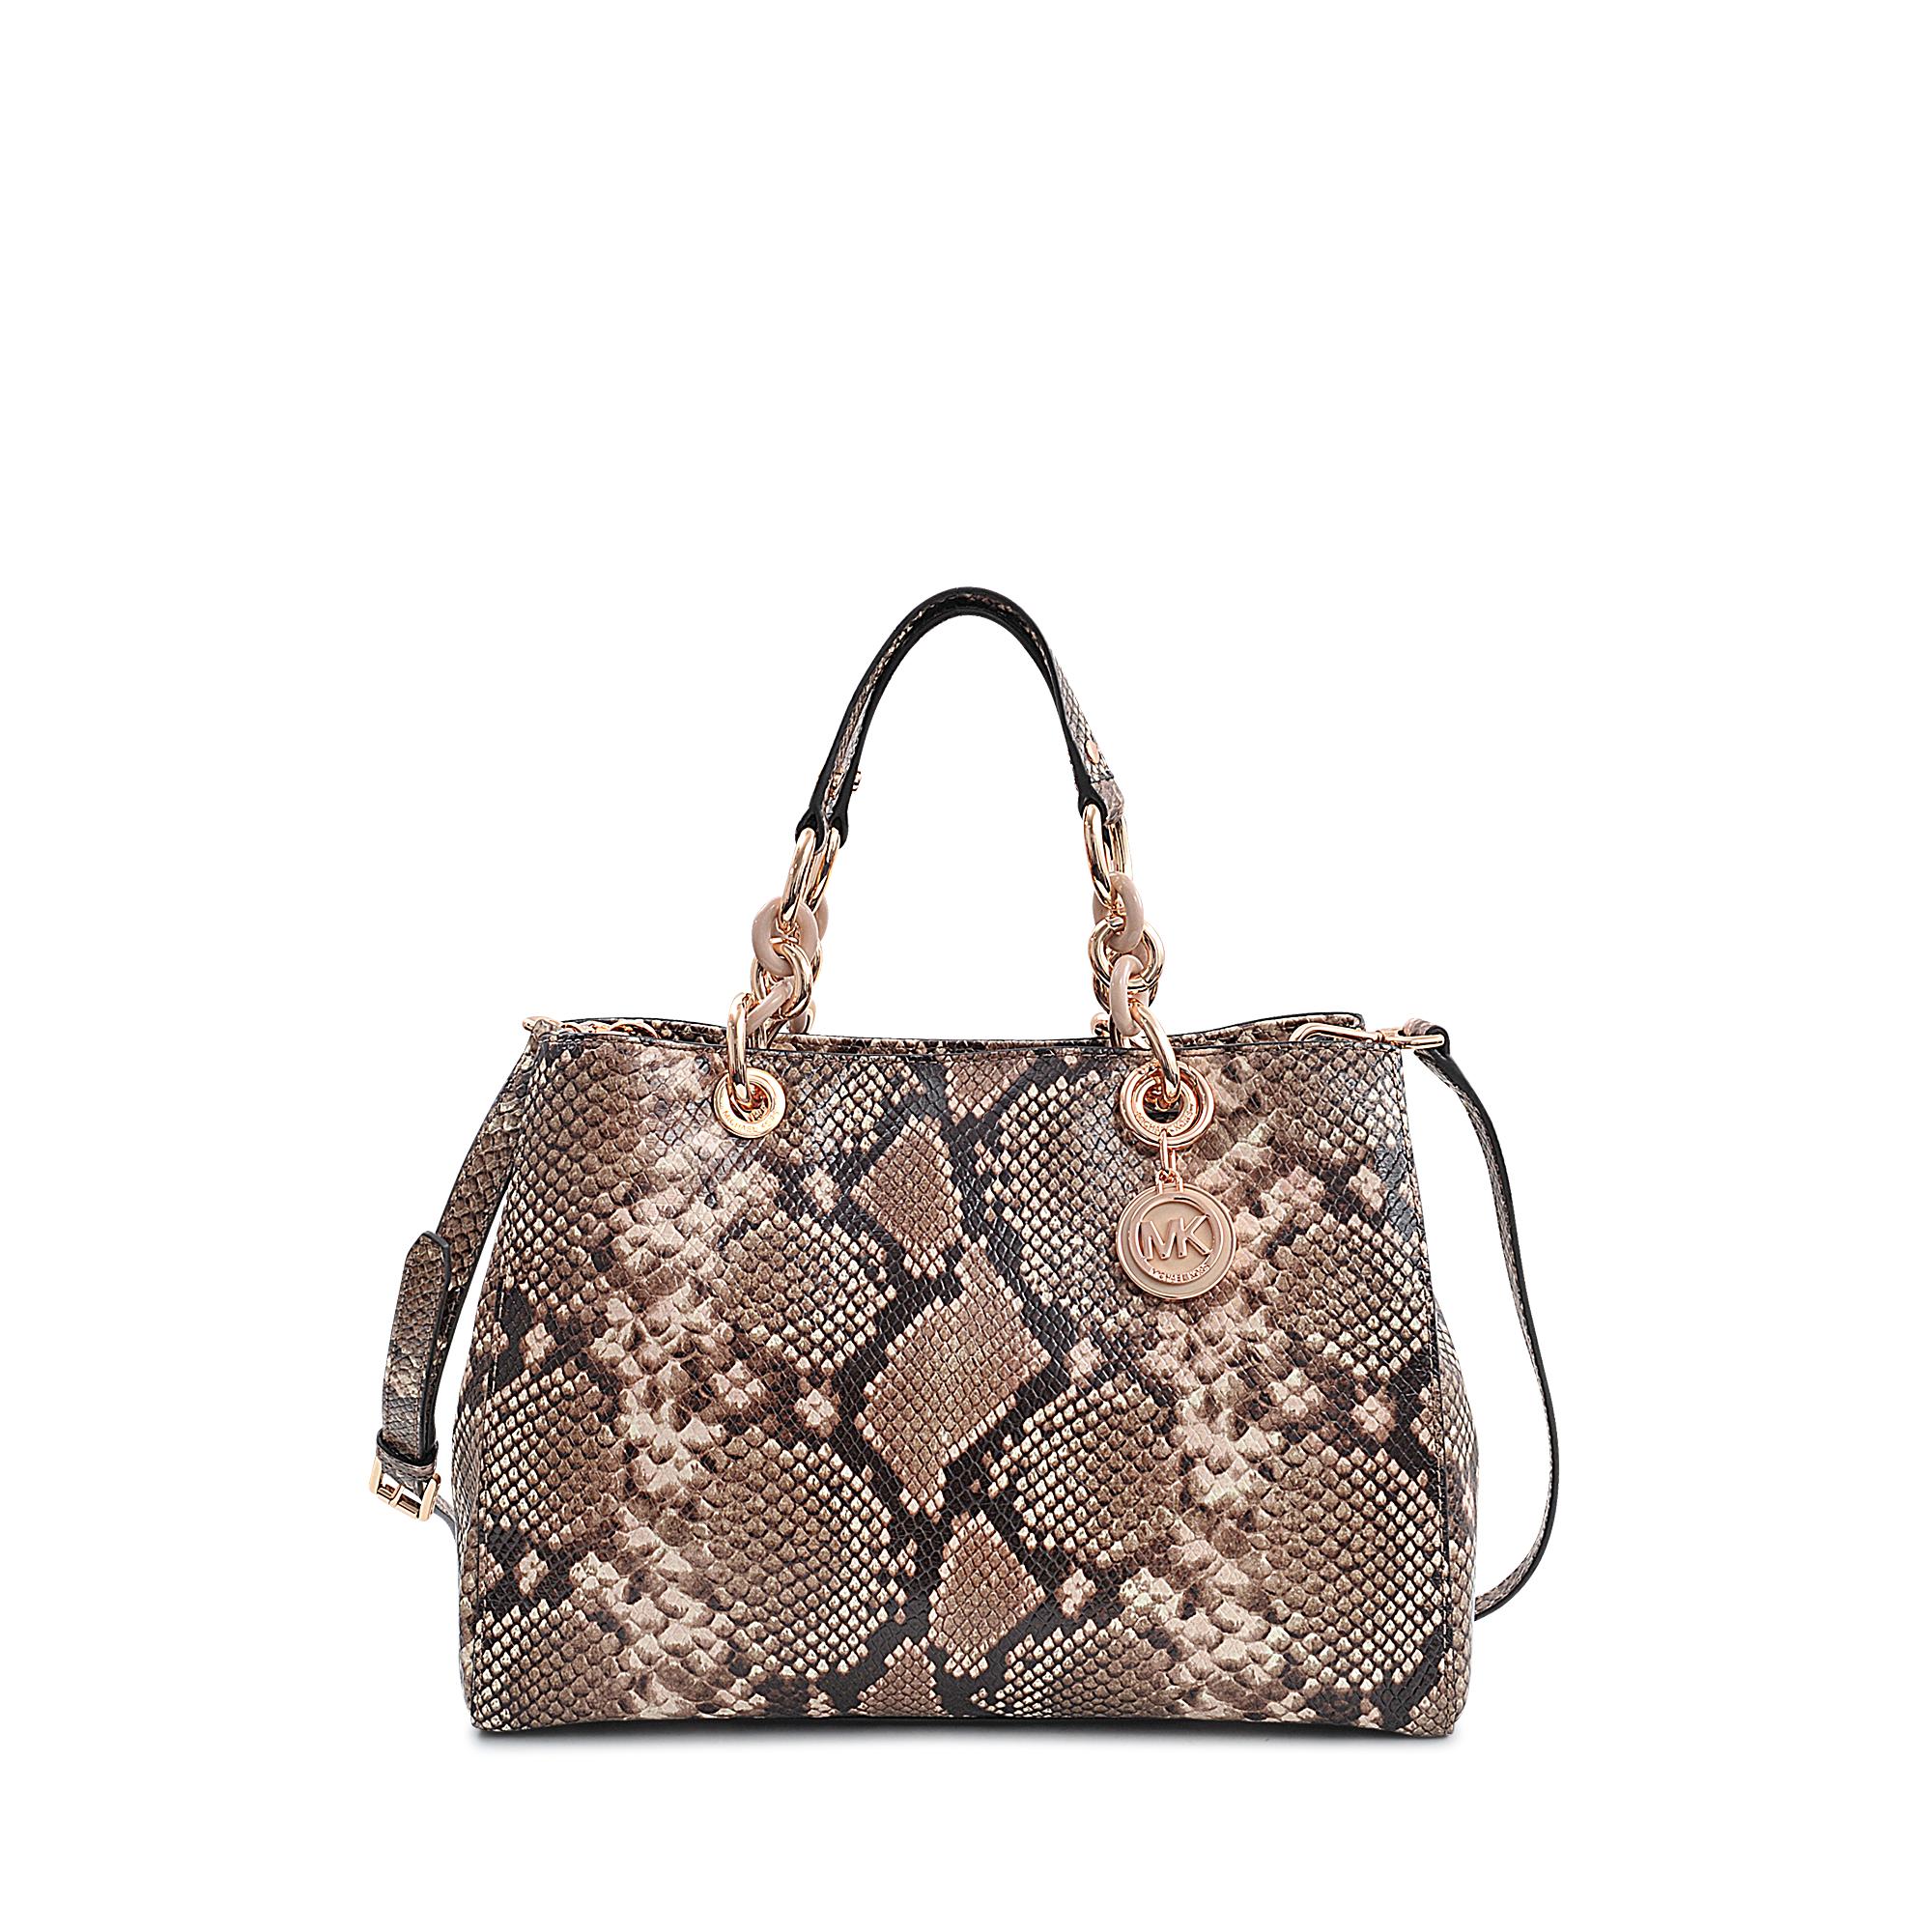 michael kors cynthia snake embossed satchel lyst. Black Bedroom Furniture Sets. Home Design Ideas